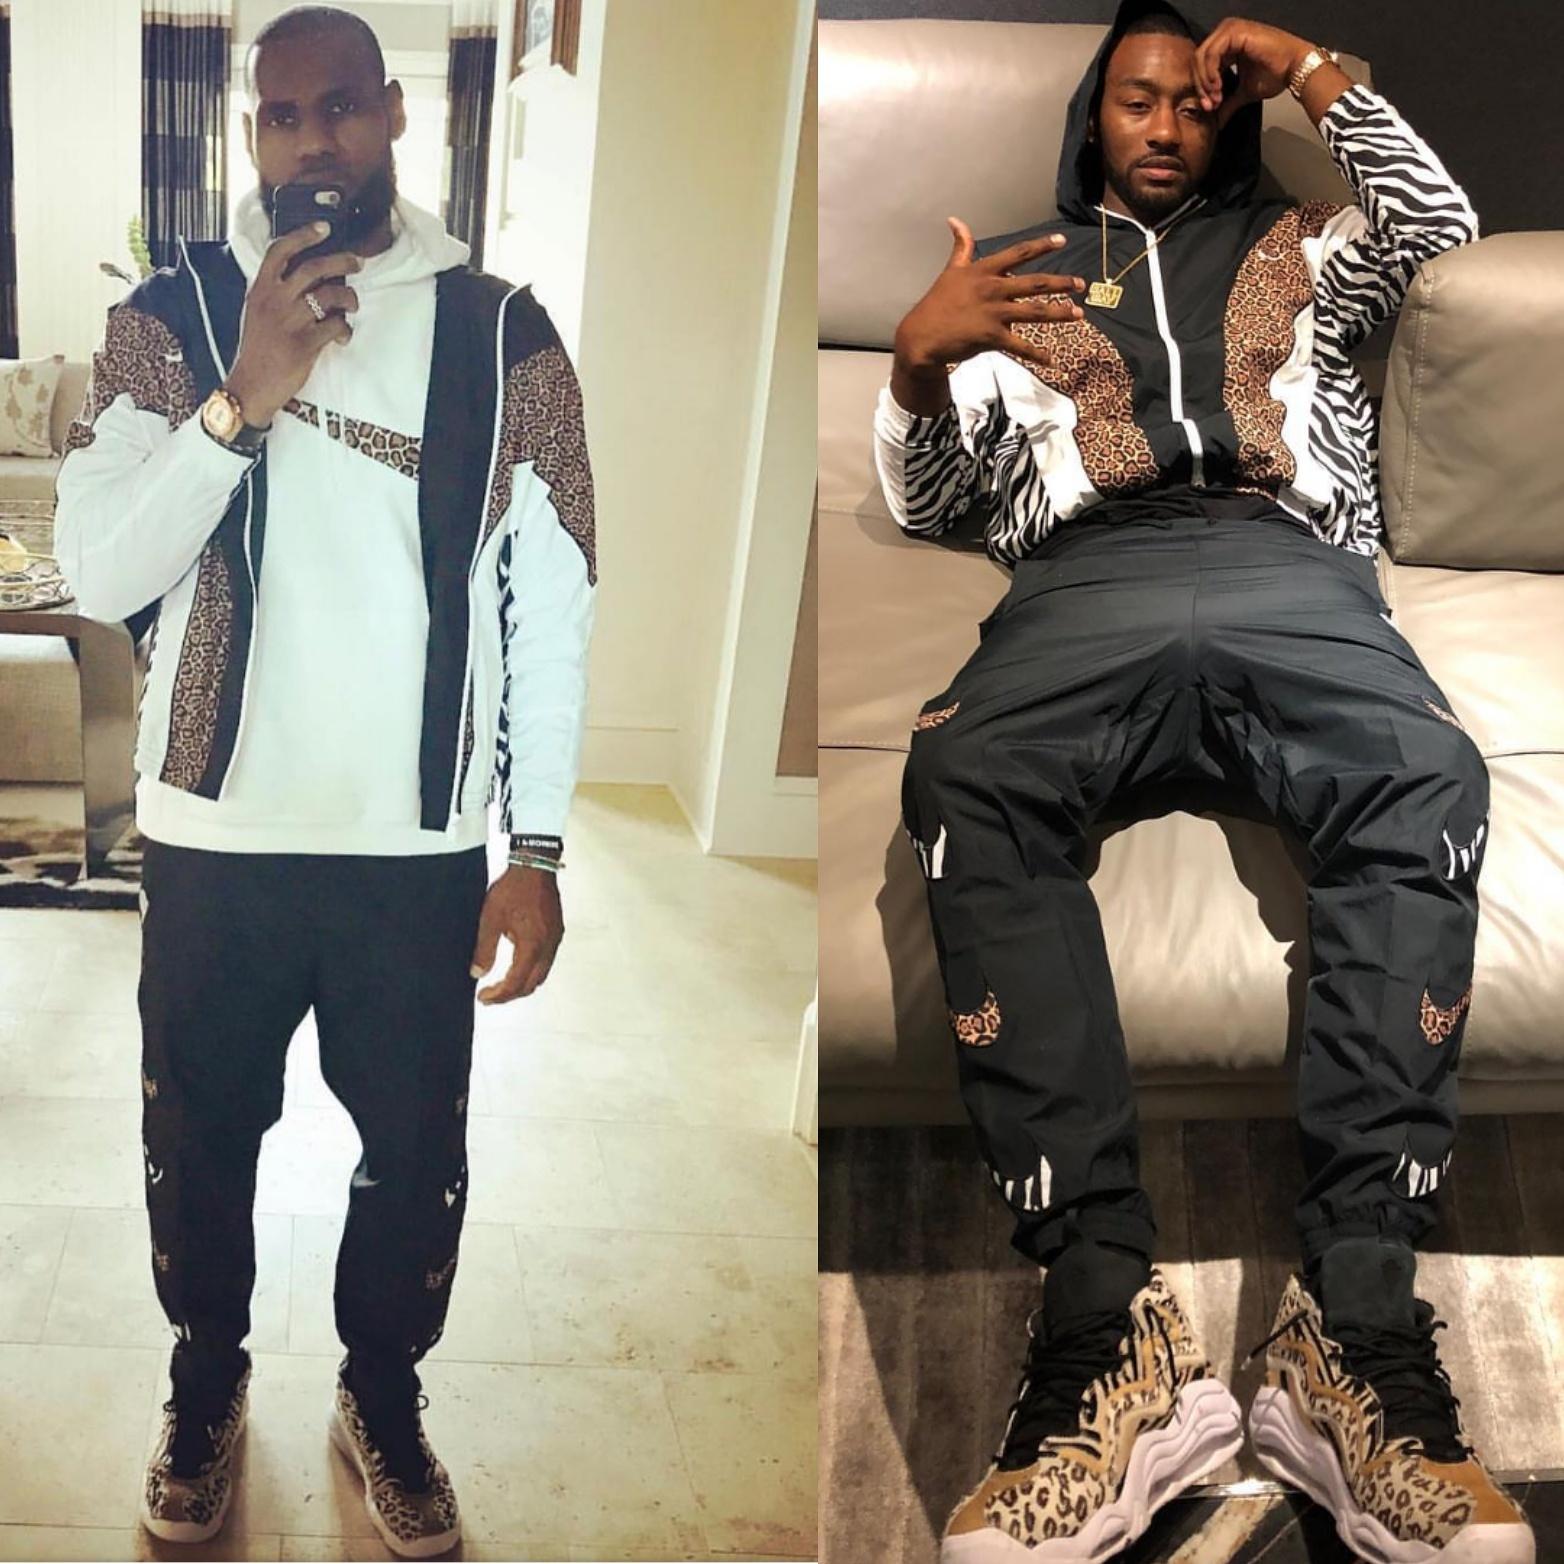 Lebron James VS. John Wall Wearing Kith x Nike Apparel